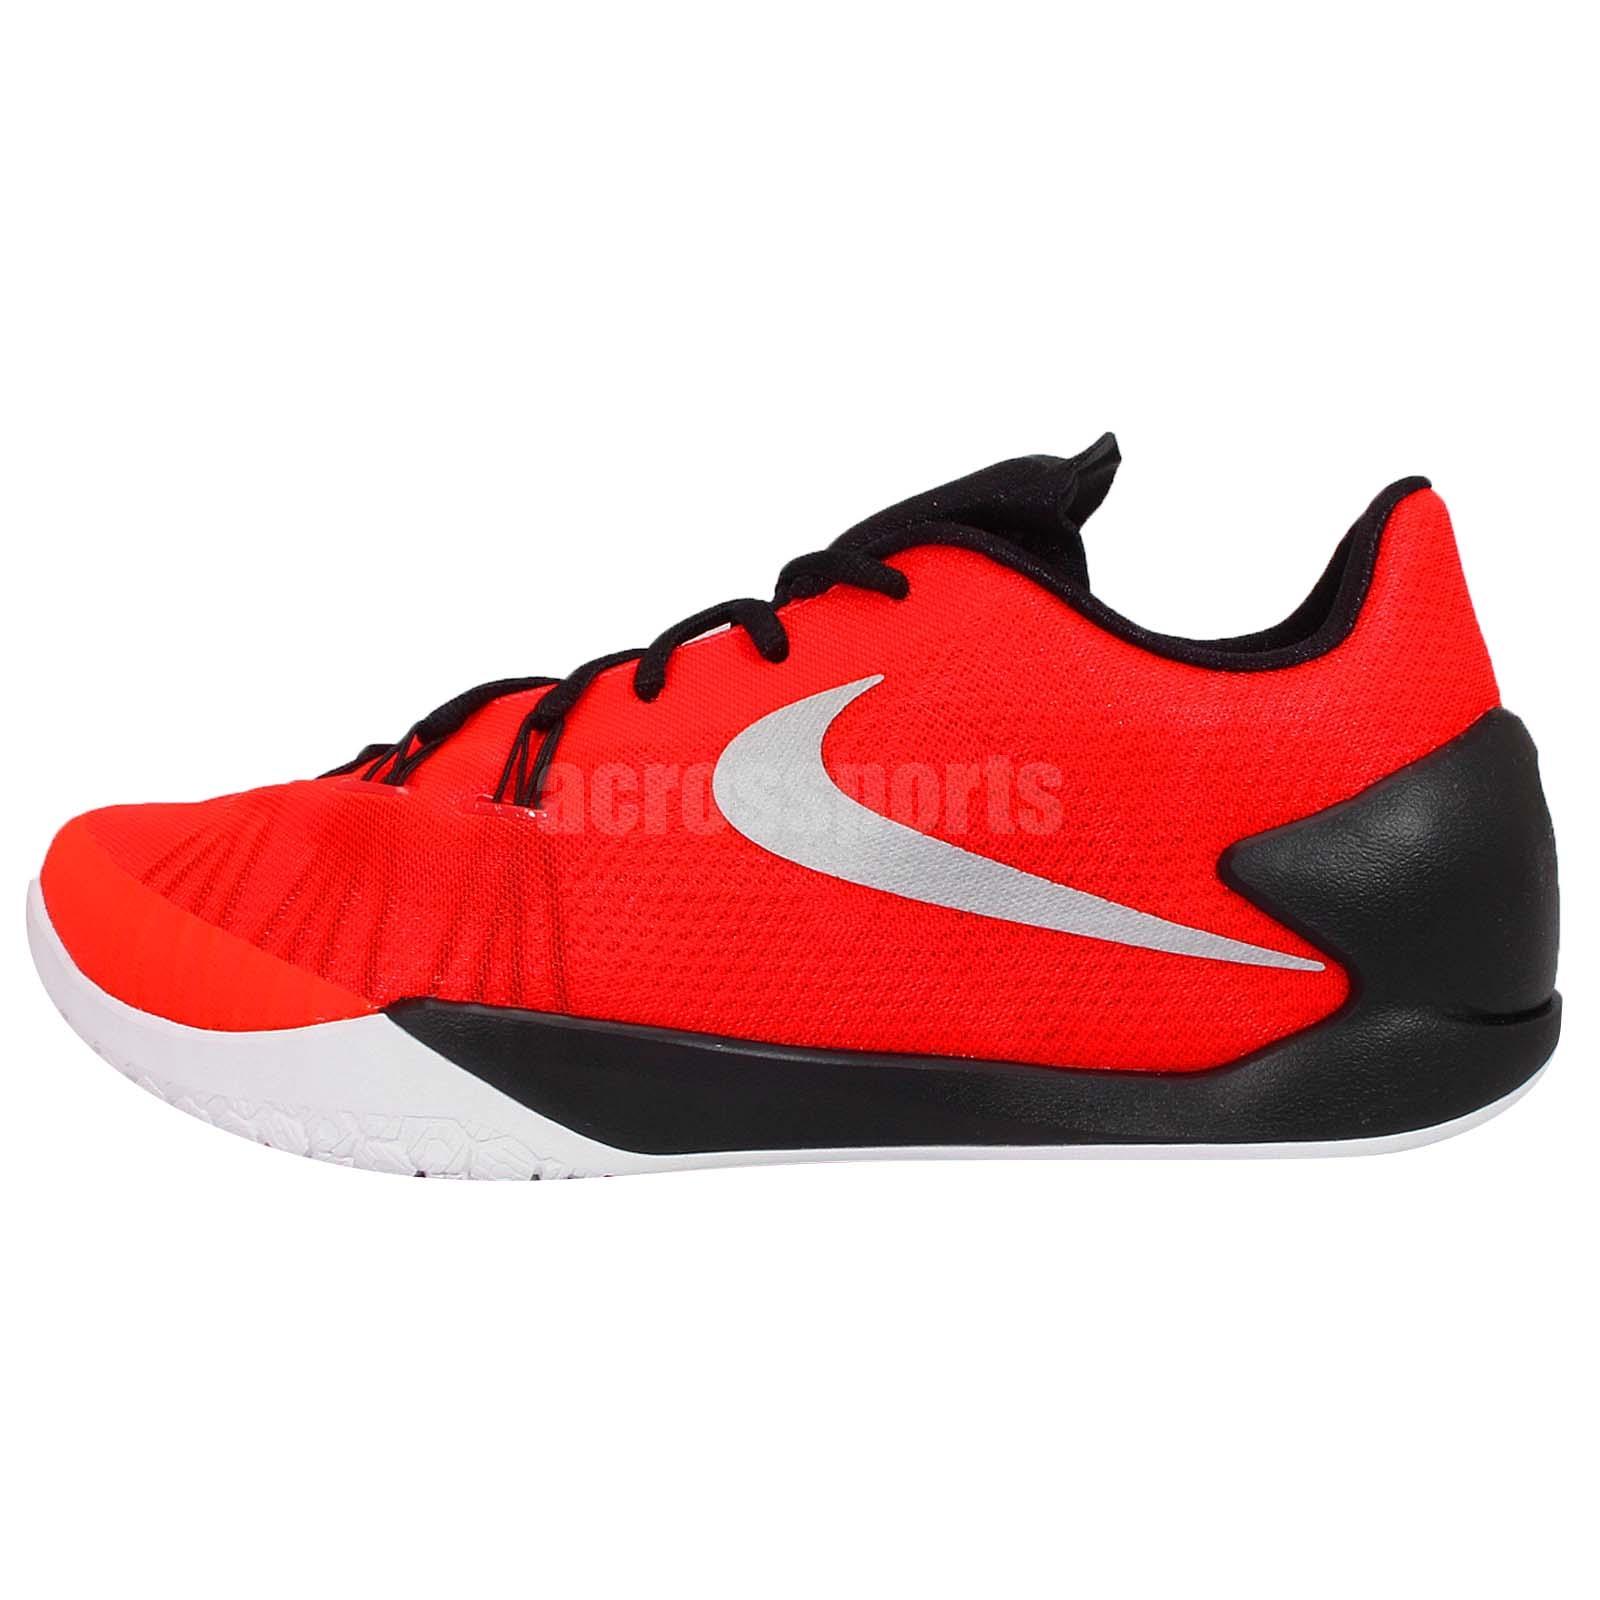 James Harden Nike Shoes: Nike Hyperchase EP Red Silver Black James Harden Mens